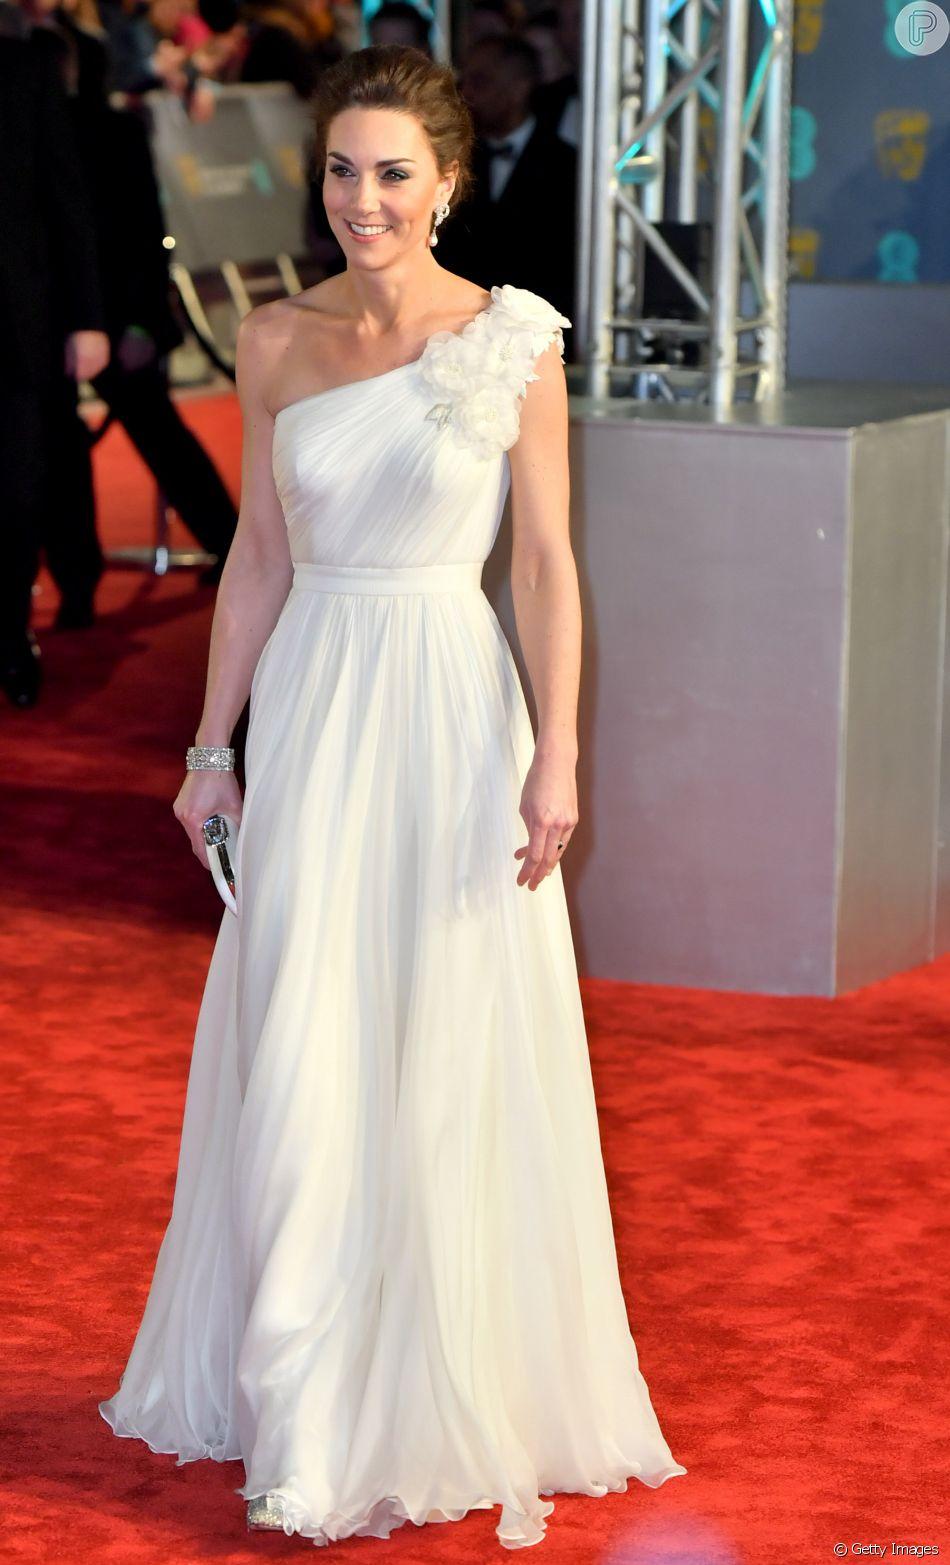 Kate Middleton usou vestido branco plissado assinado por Alexanderno BAFTA 2019